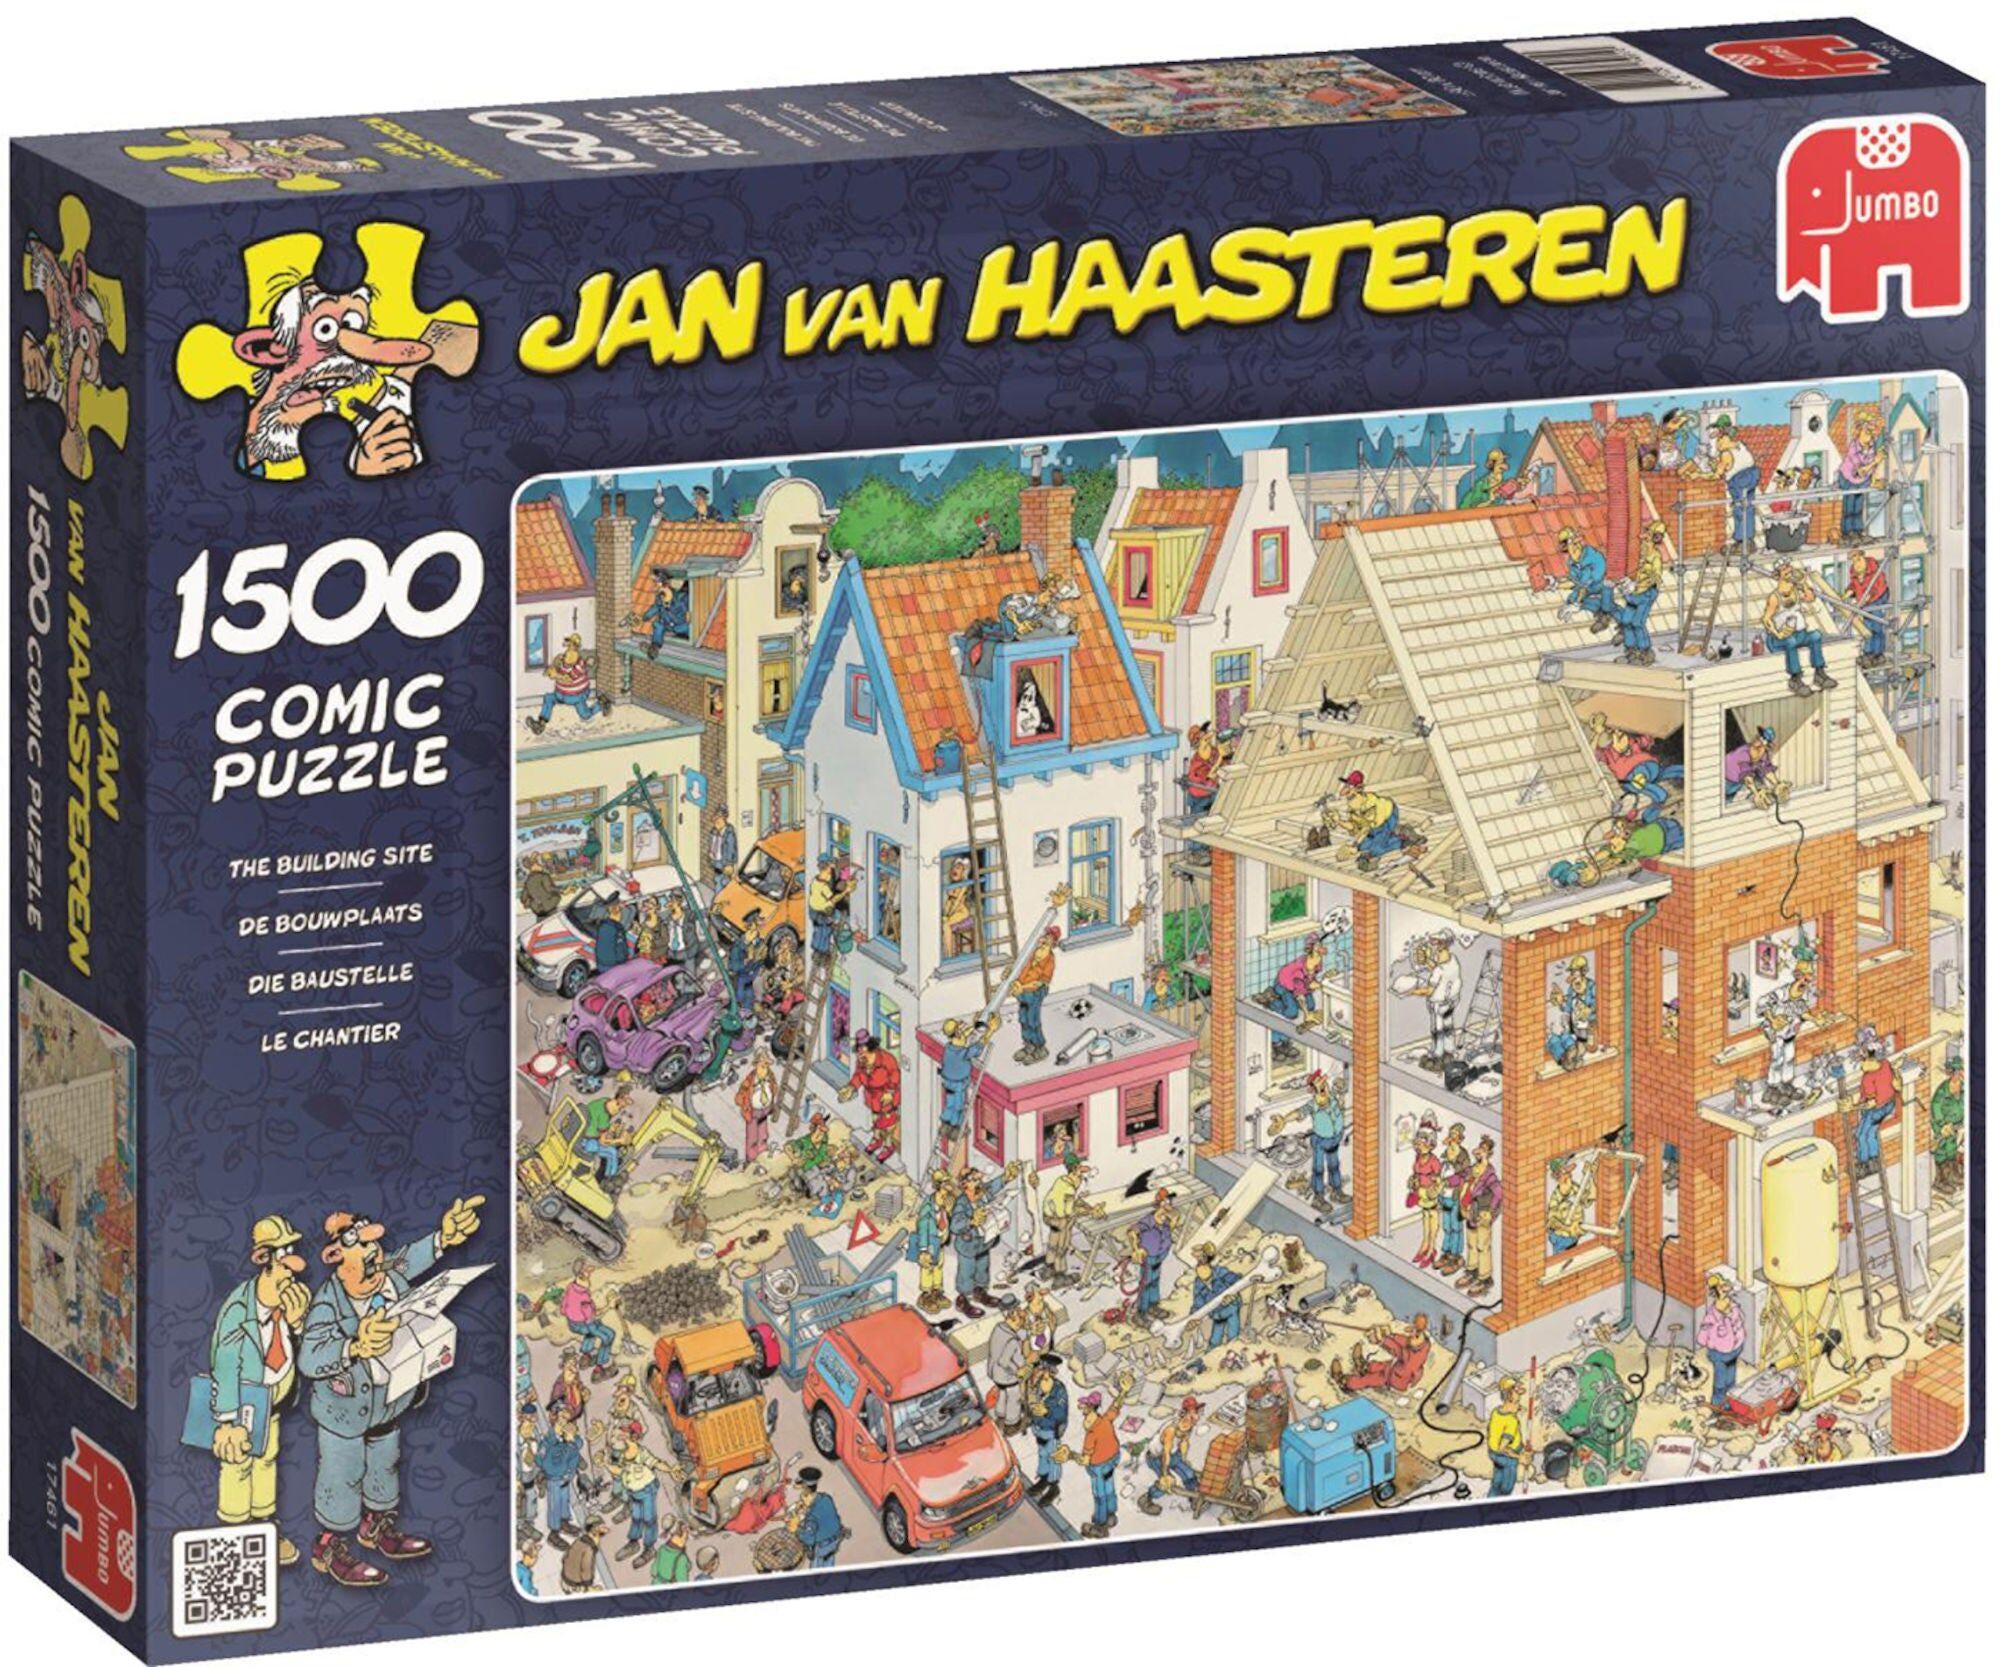 Jumbo Puslespill Jan van Haasteren Building Site 1500